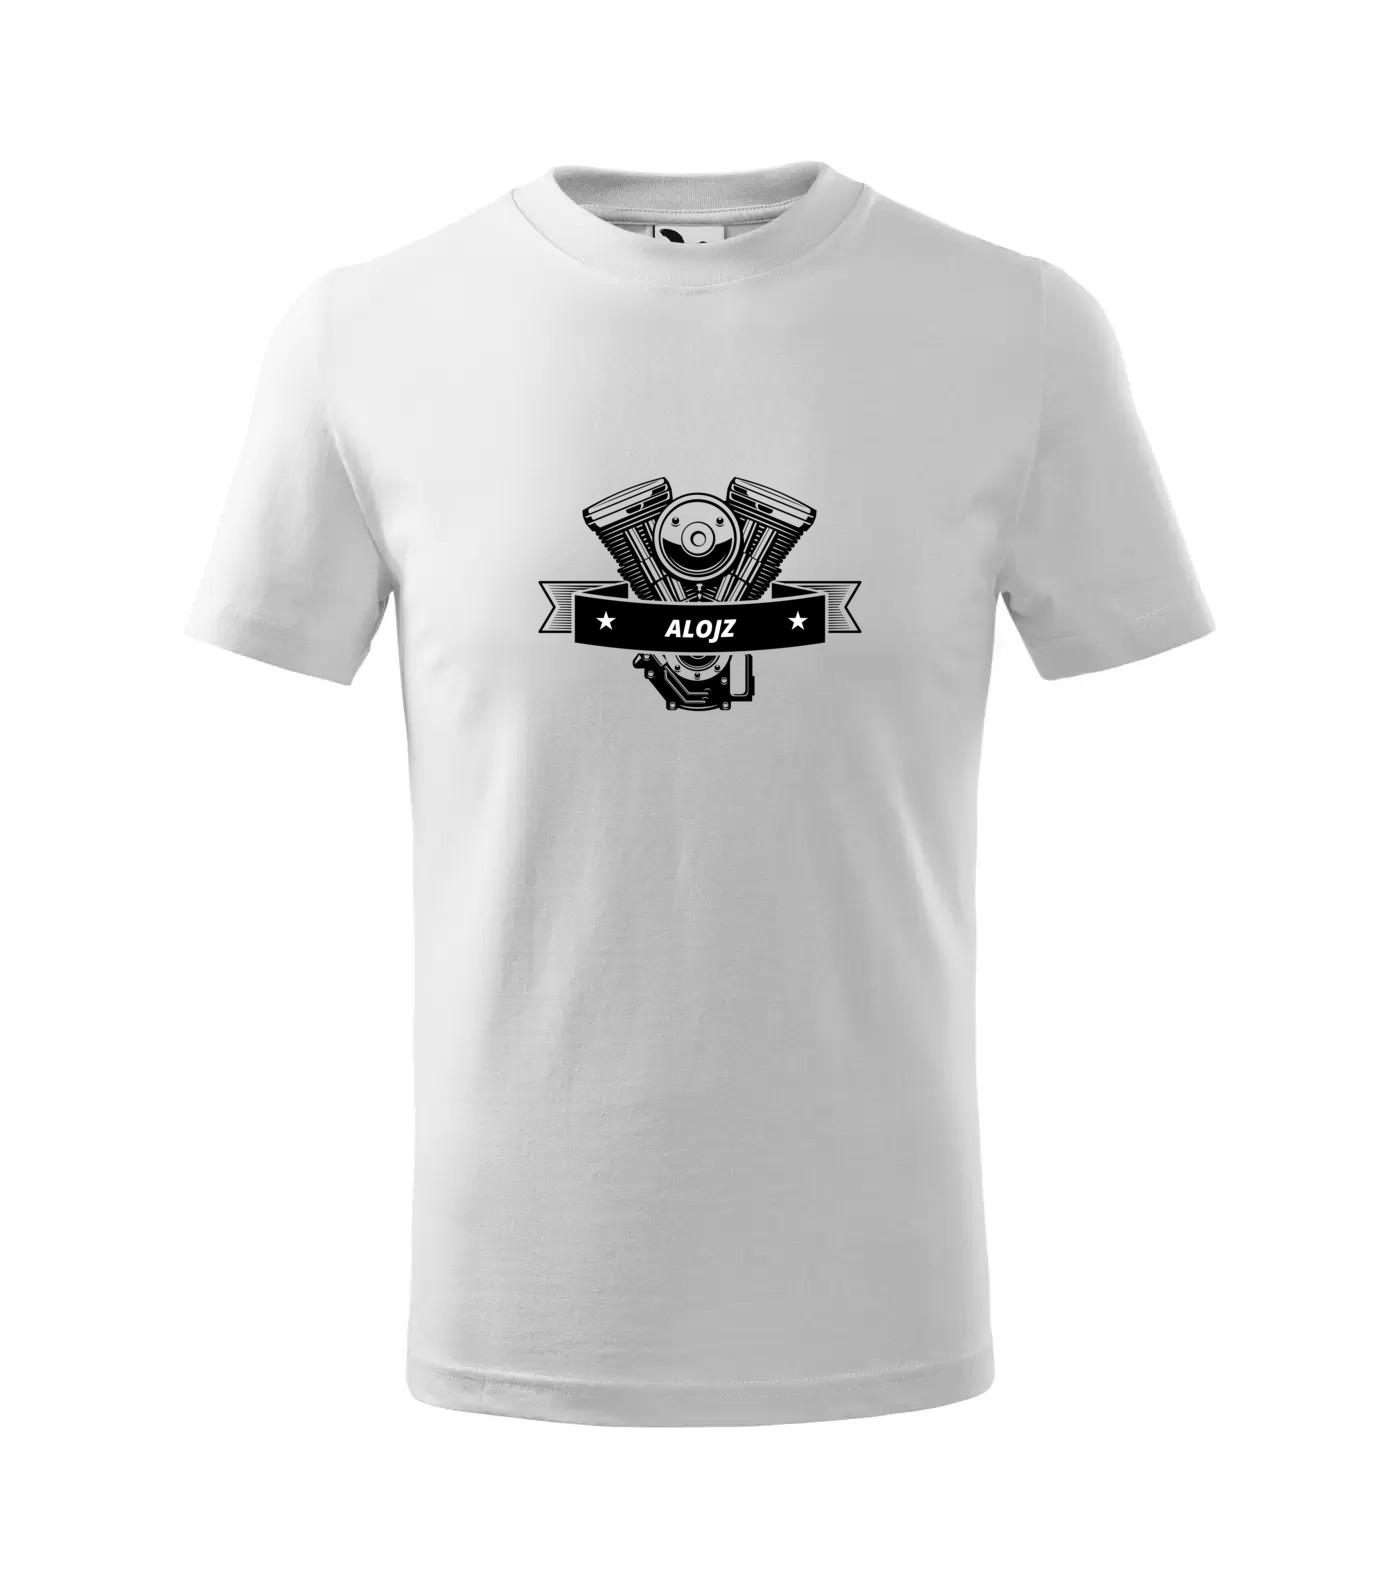 Tričko Motorkář Alojz